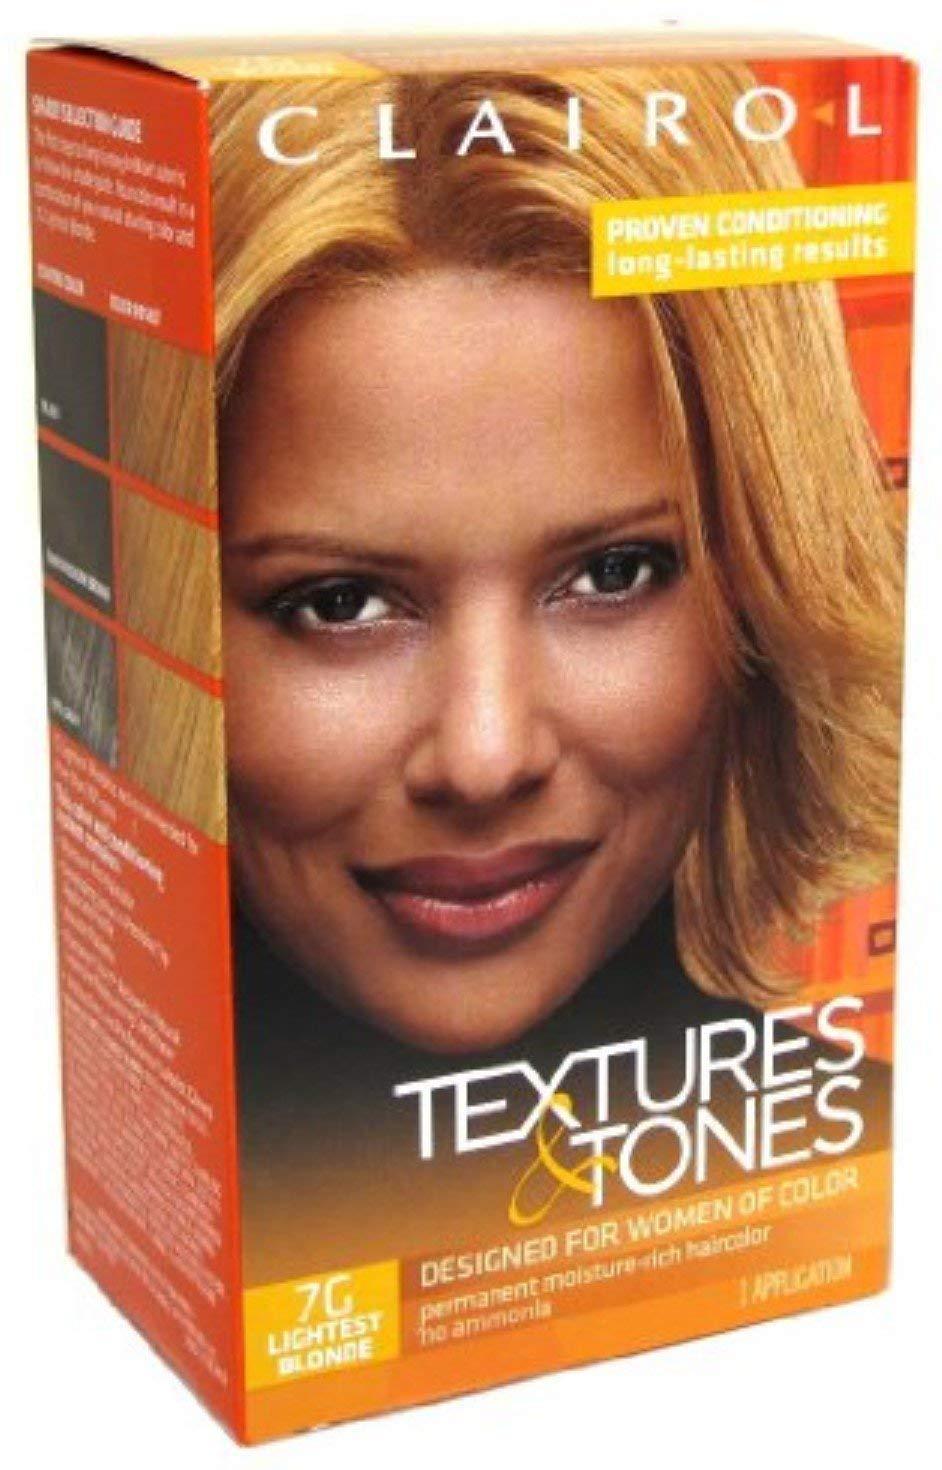 Clairol Textures & Tones 7G Lightest Blonde, 1 oz